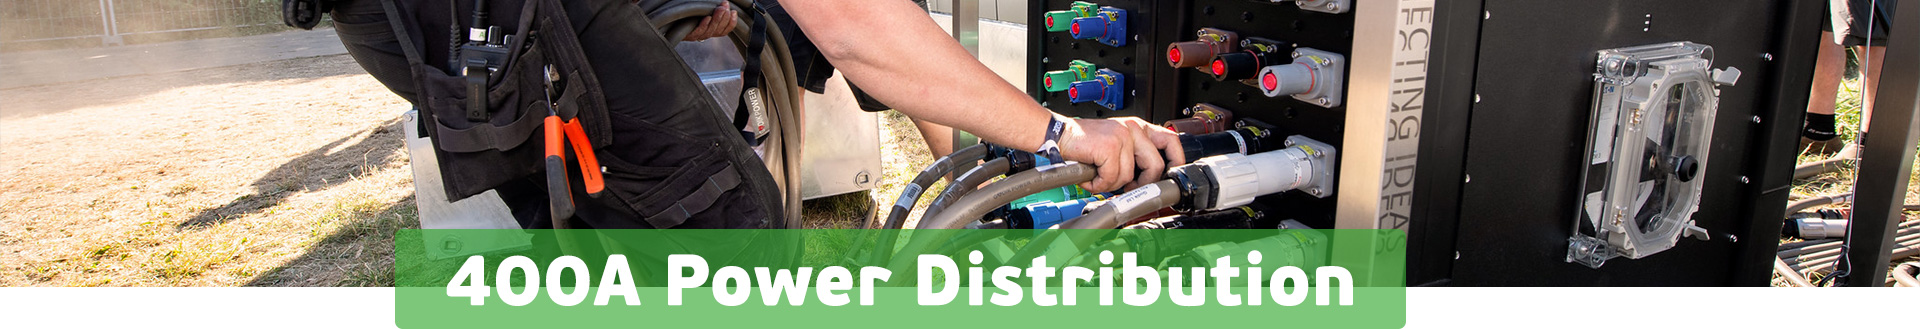 400A Power Distribution